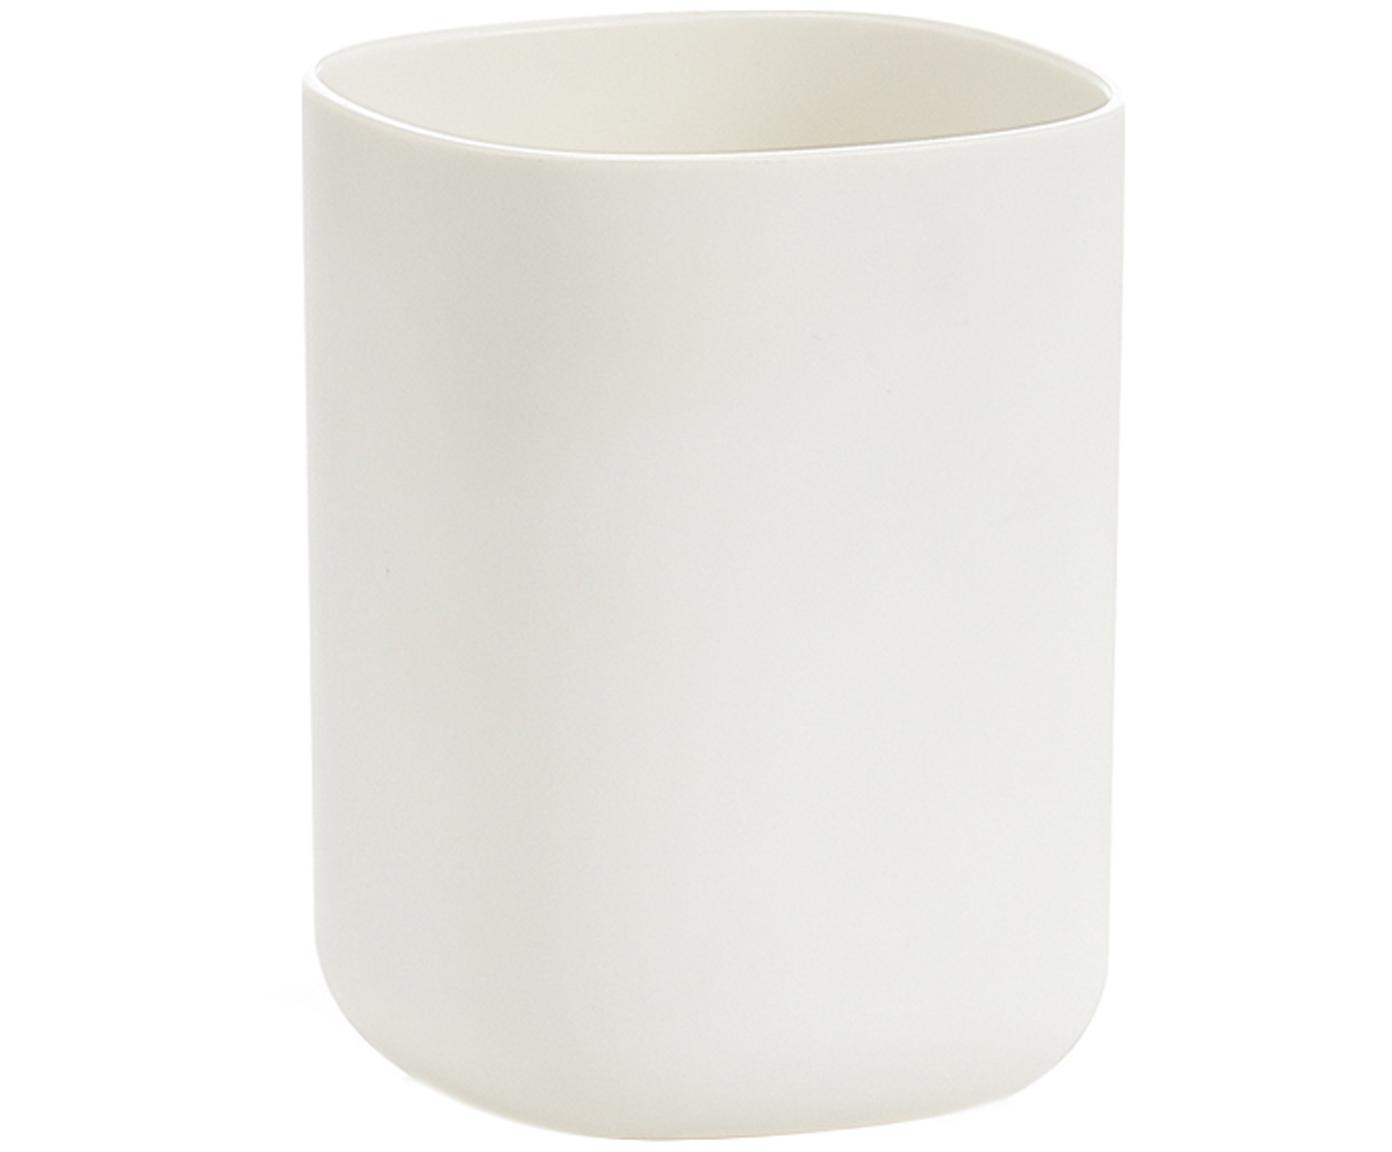 Zahnputzbecher Caro, Kunststoff, Weiss, 7 x 10 cm